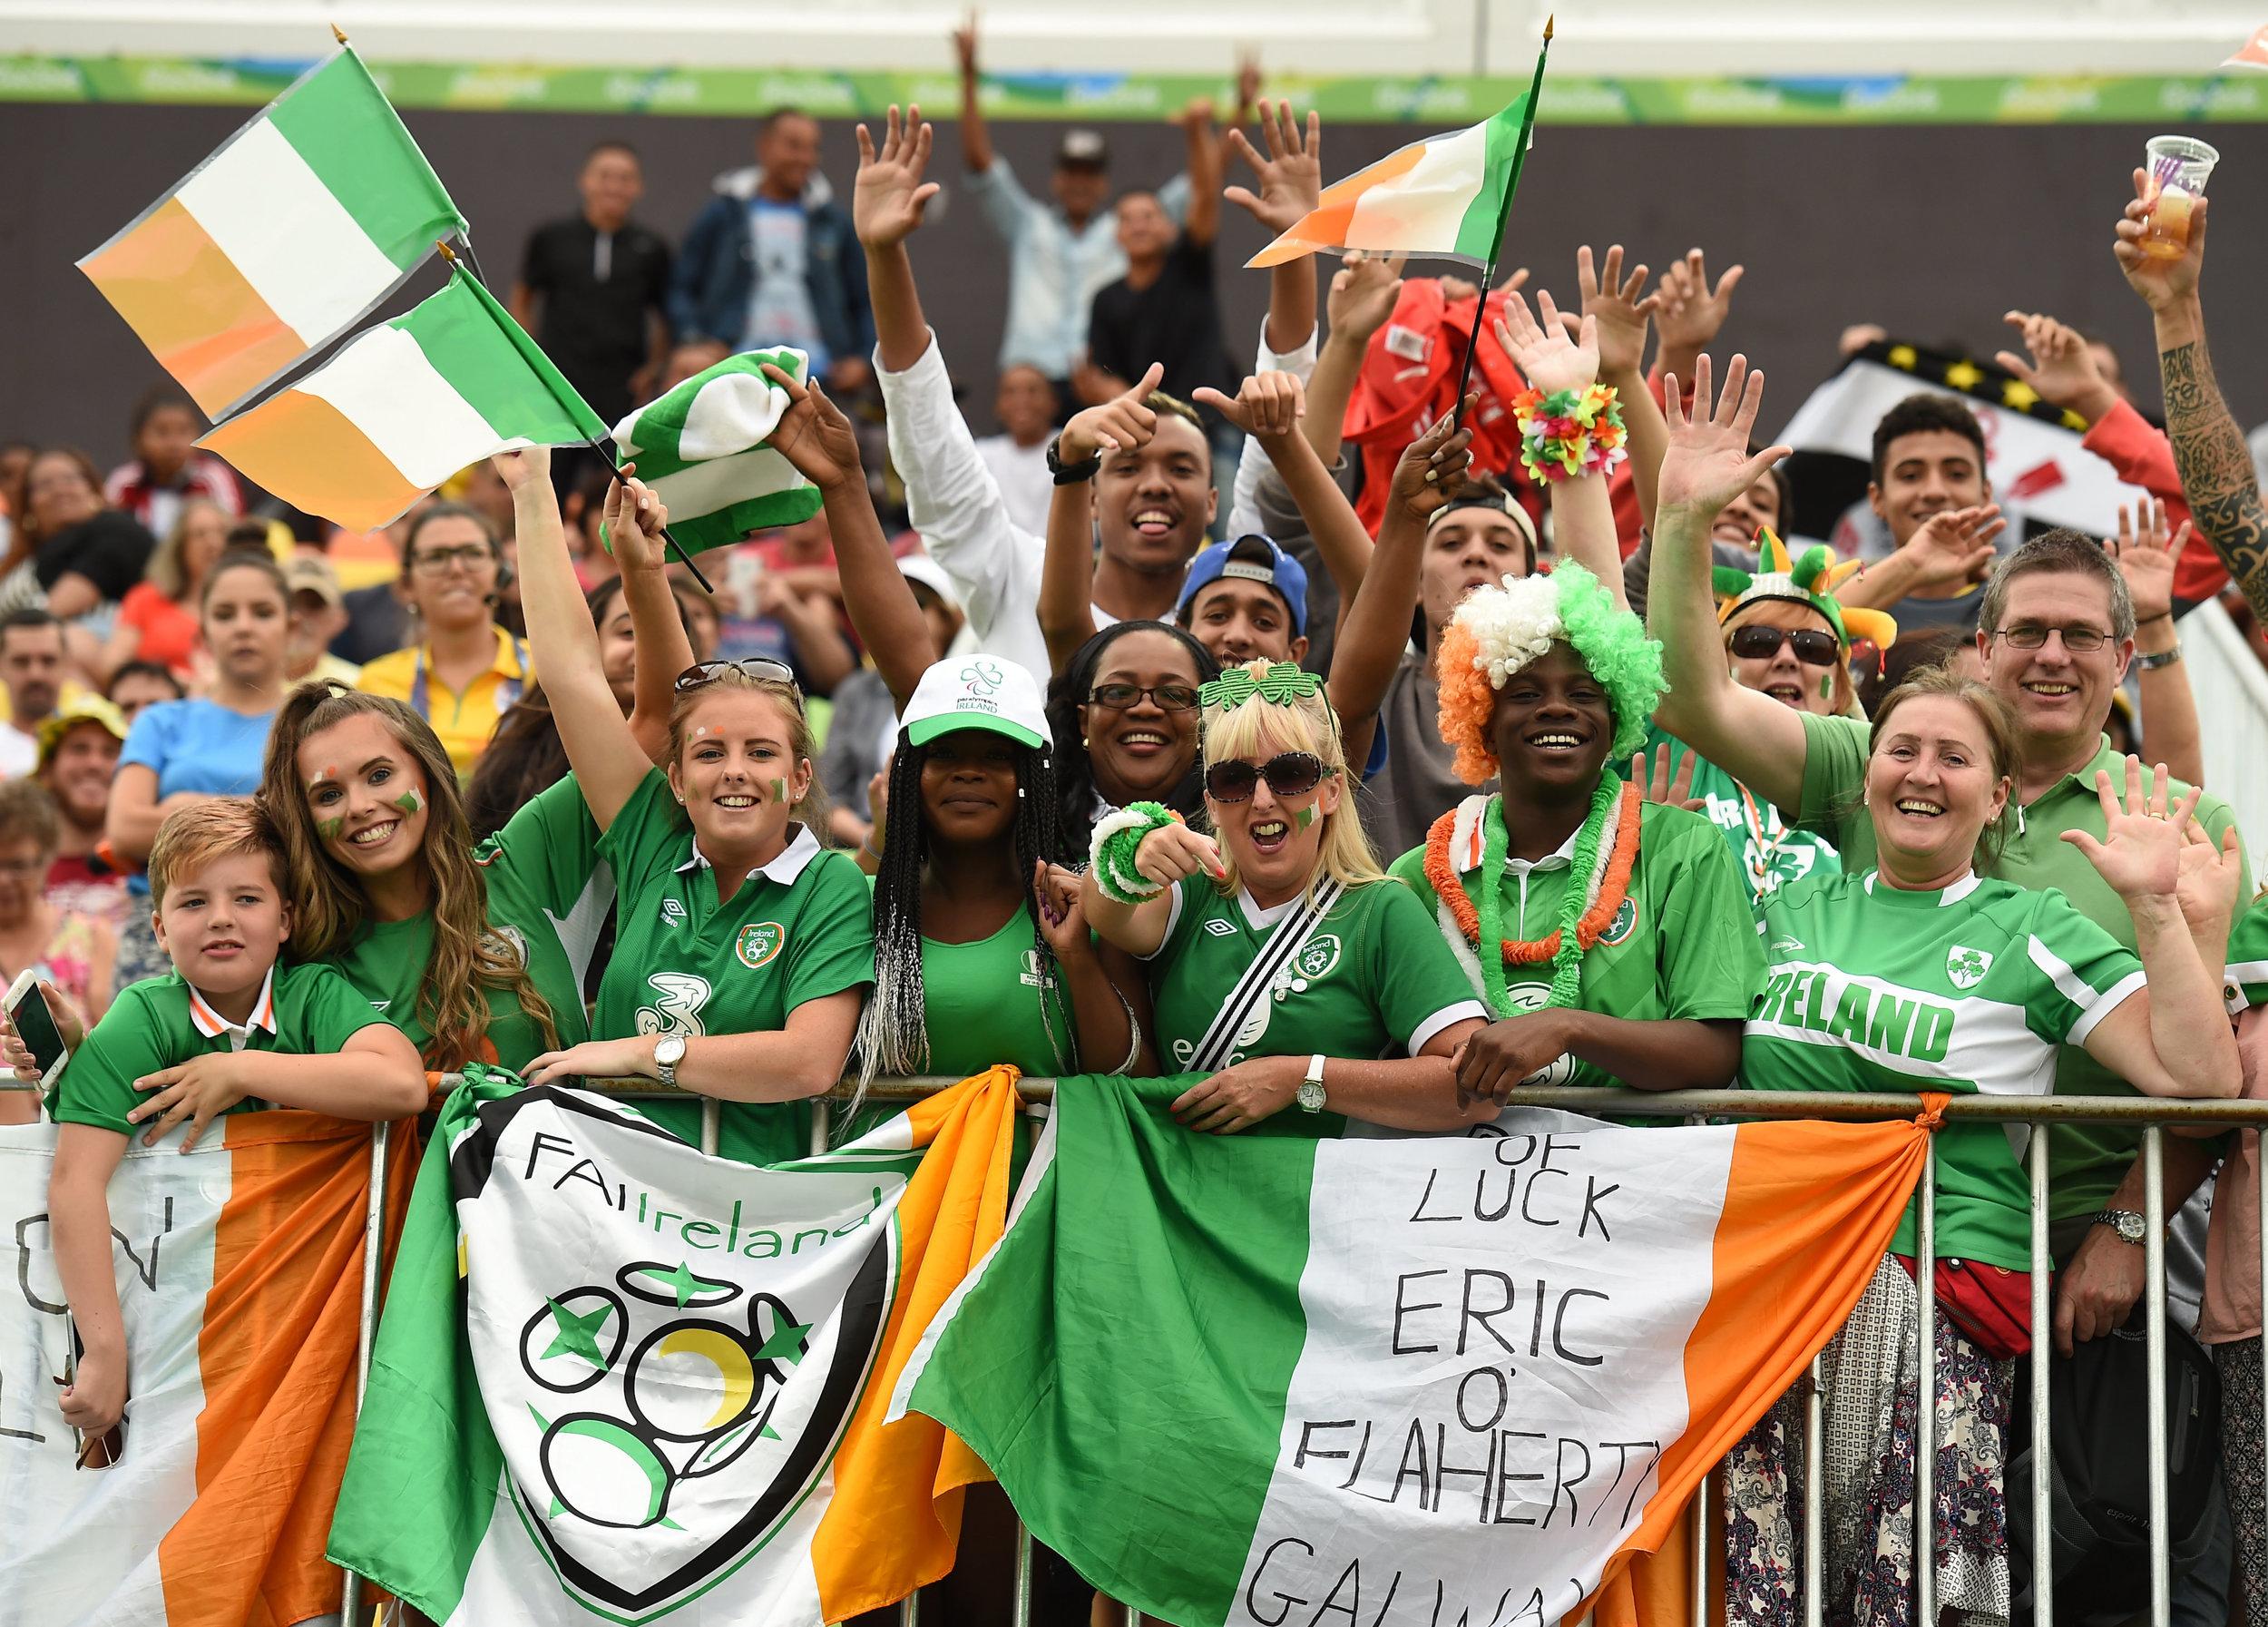 Team Ireland supporters at the Ireland v Ukraine Match